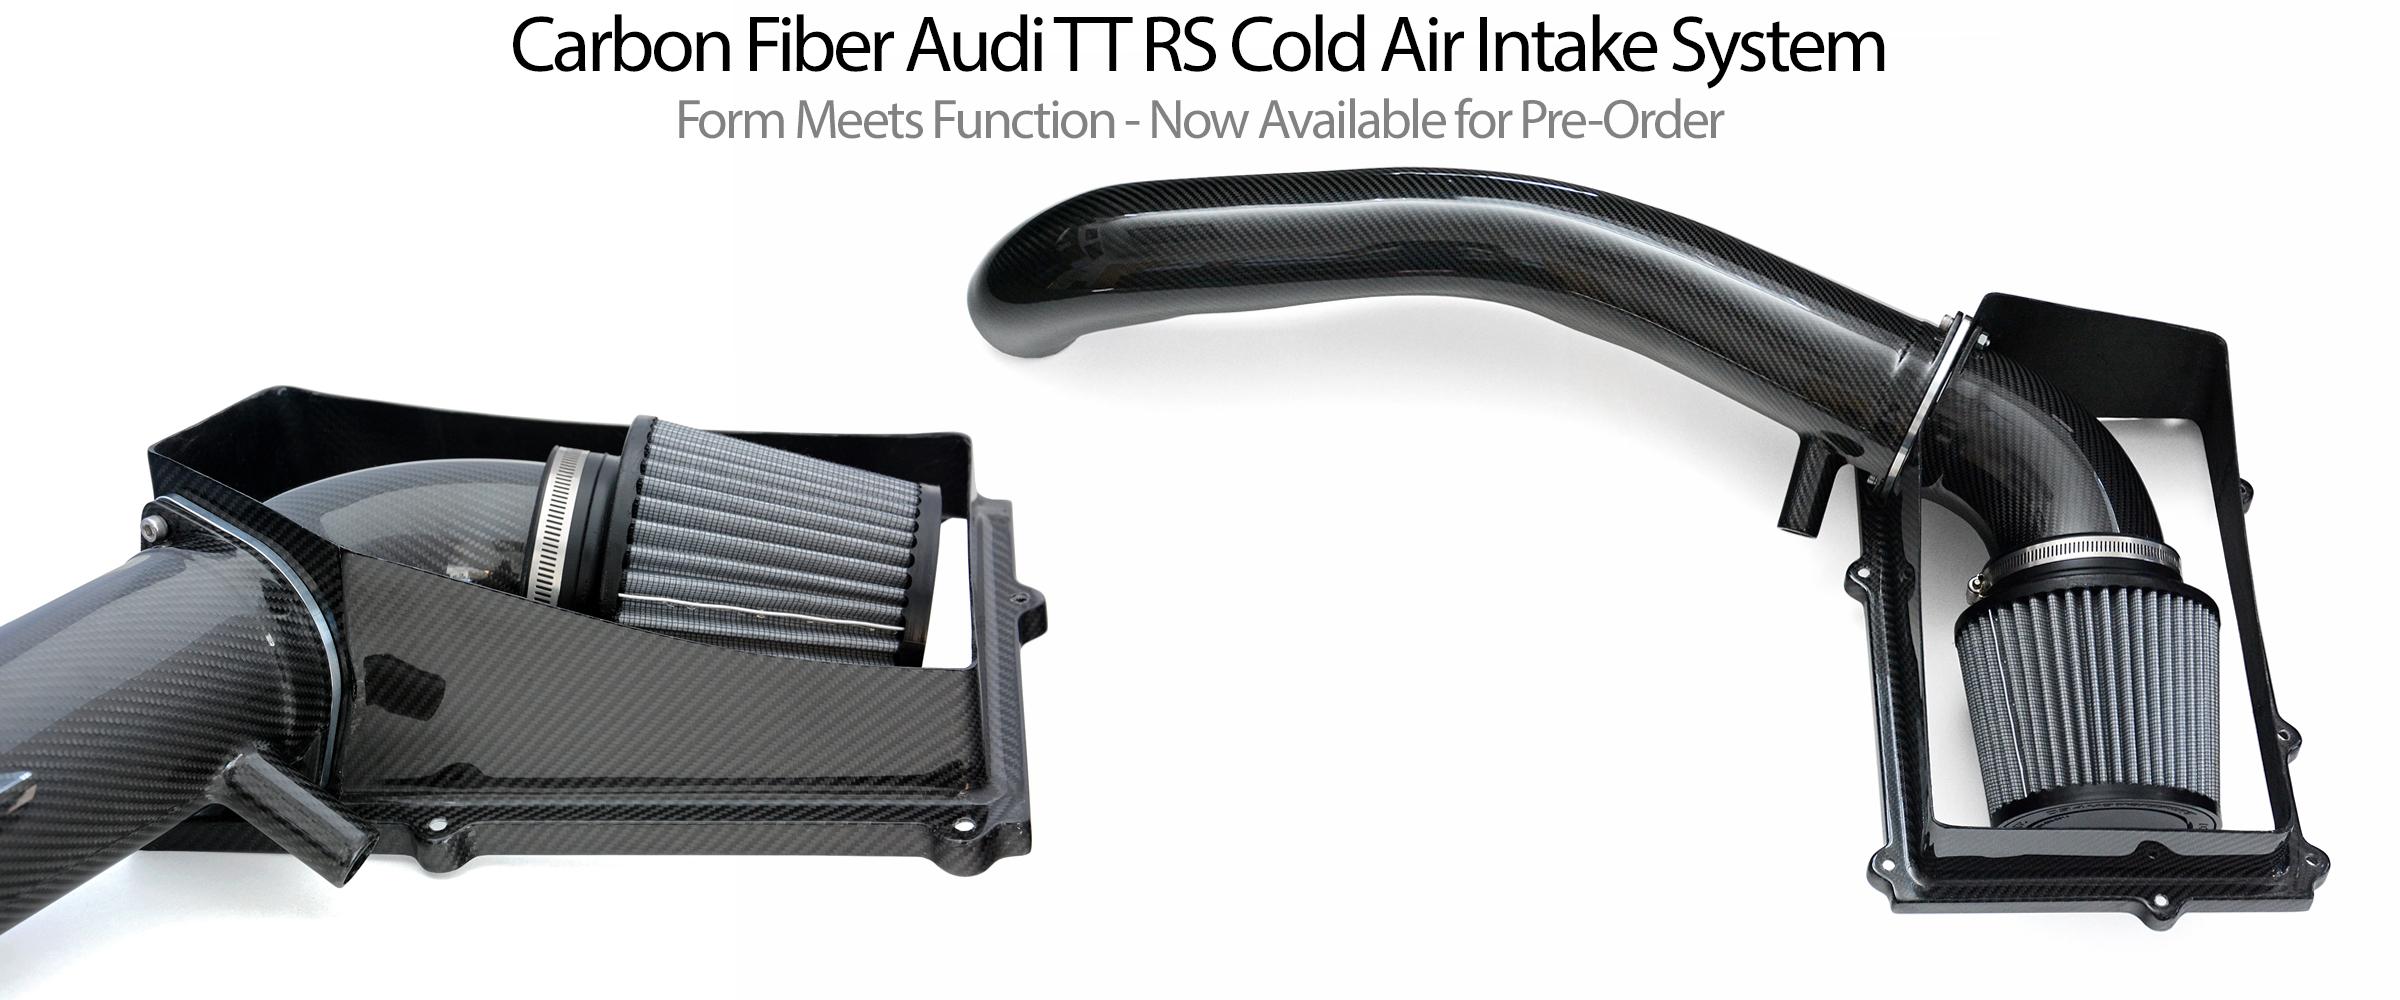 audi-ttrs-25-tfs-carbon-fiber-cold-air-intake-system